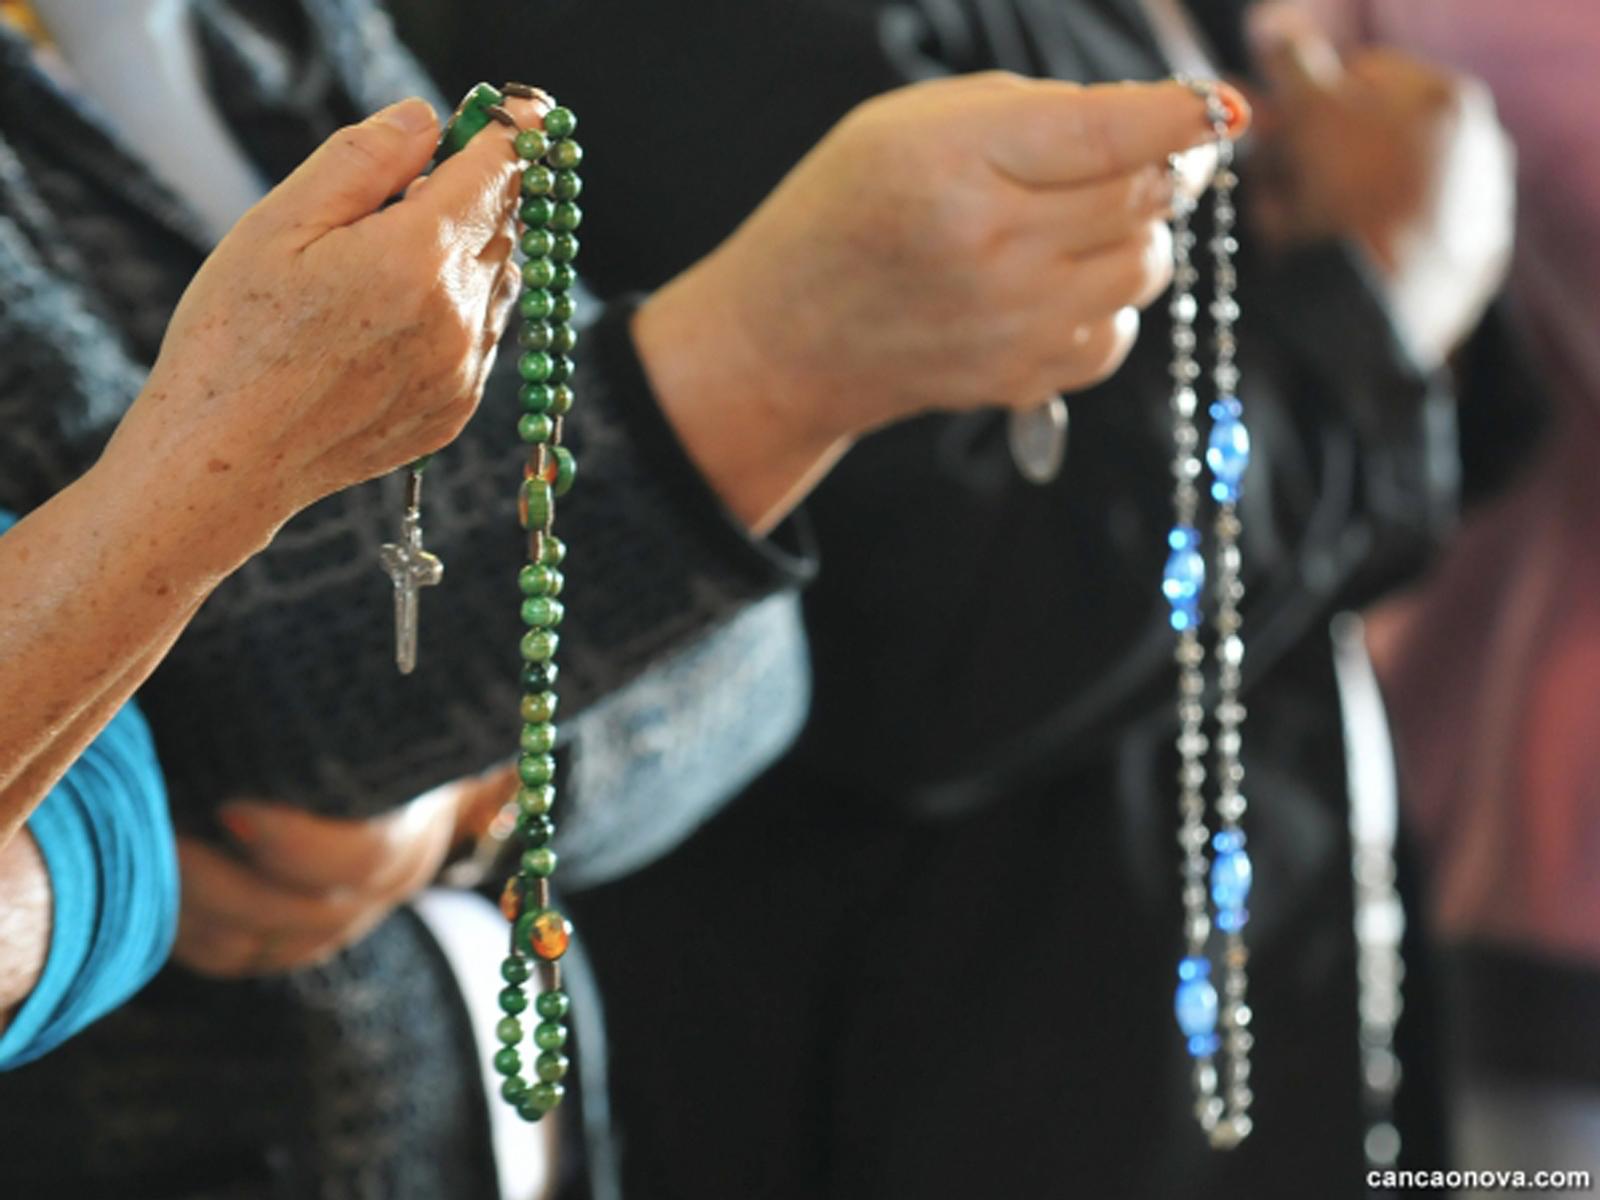 O significado de cada parte da Ave Maria - 1600x1200